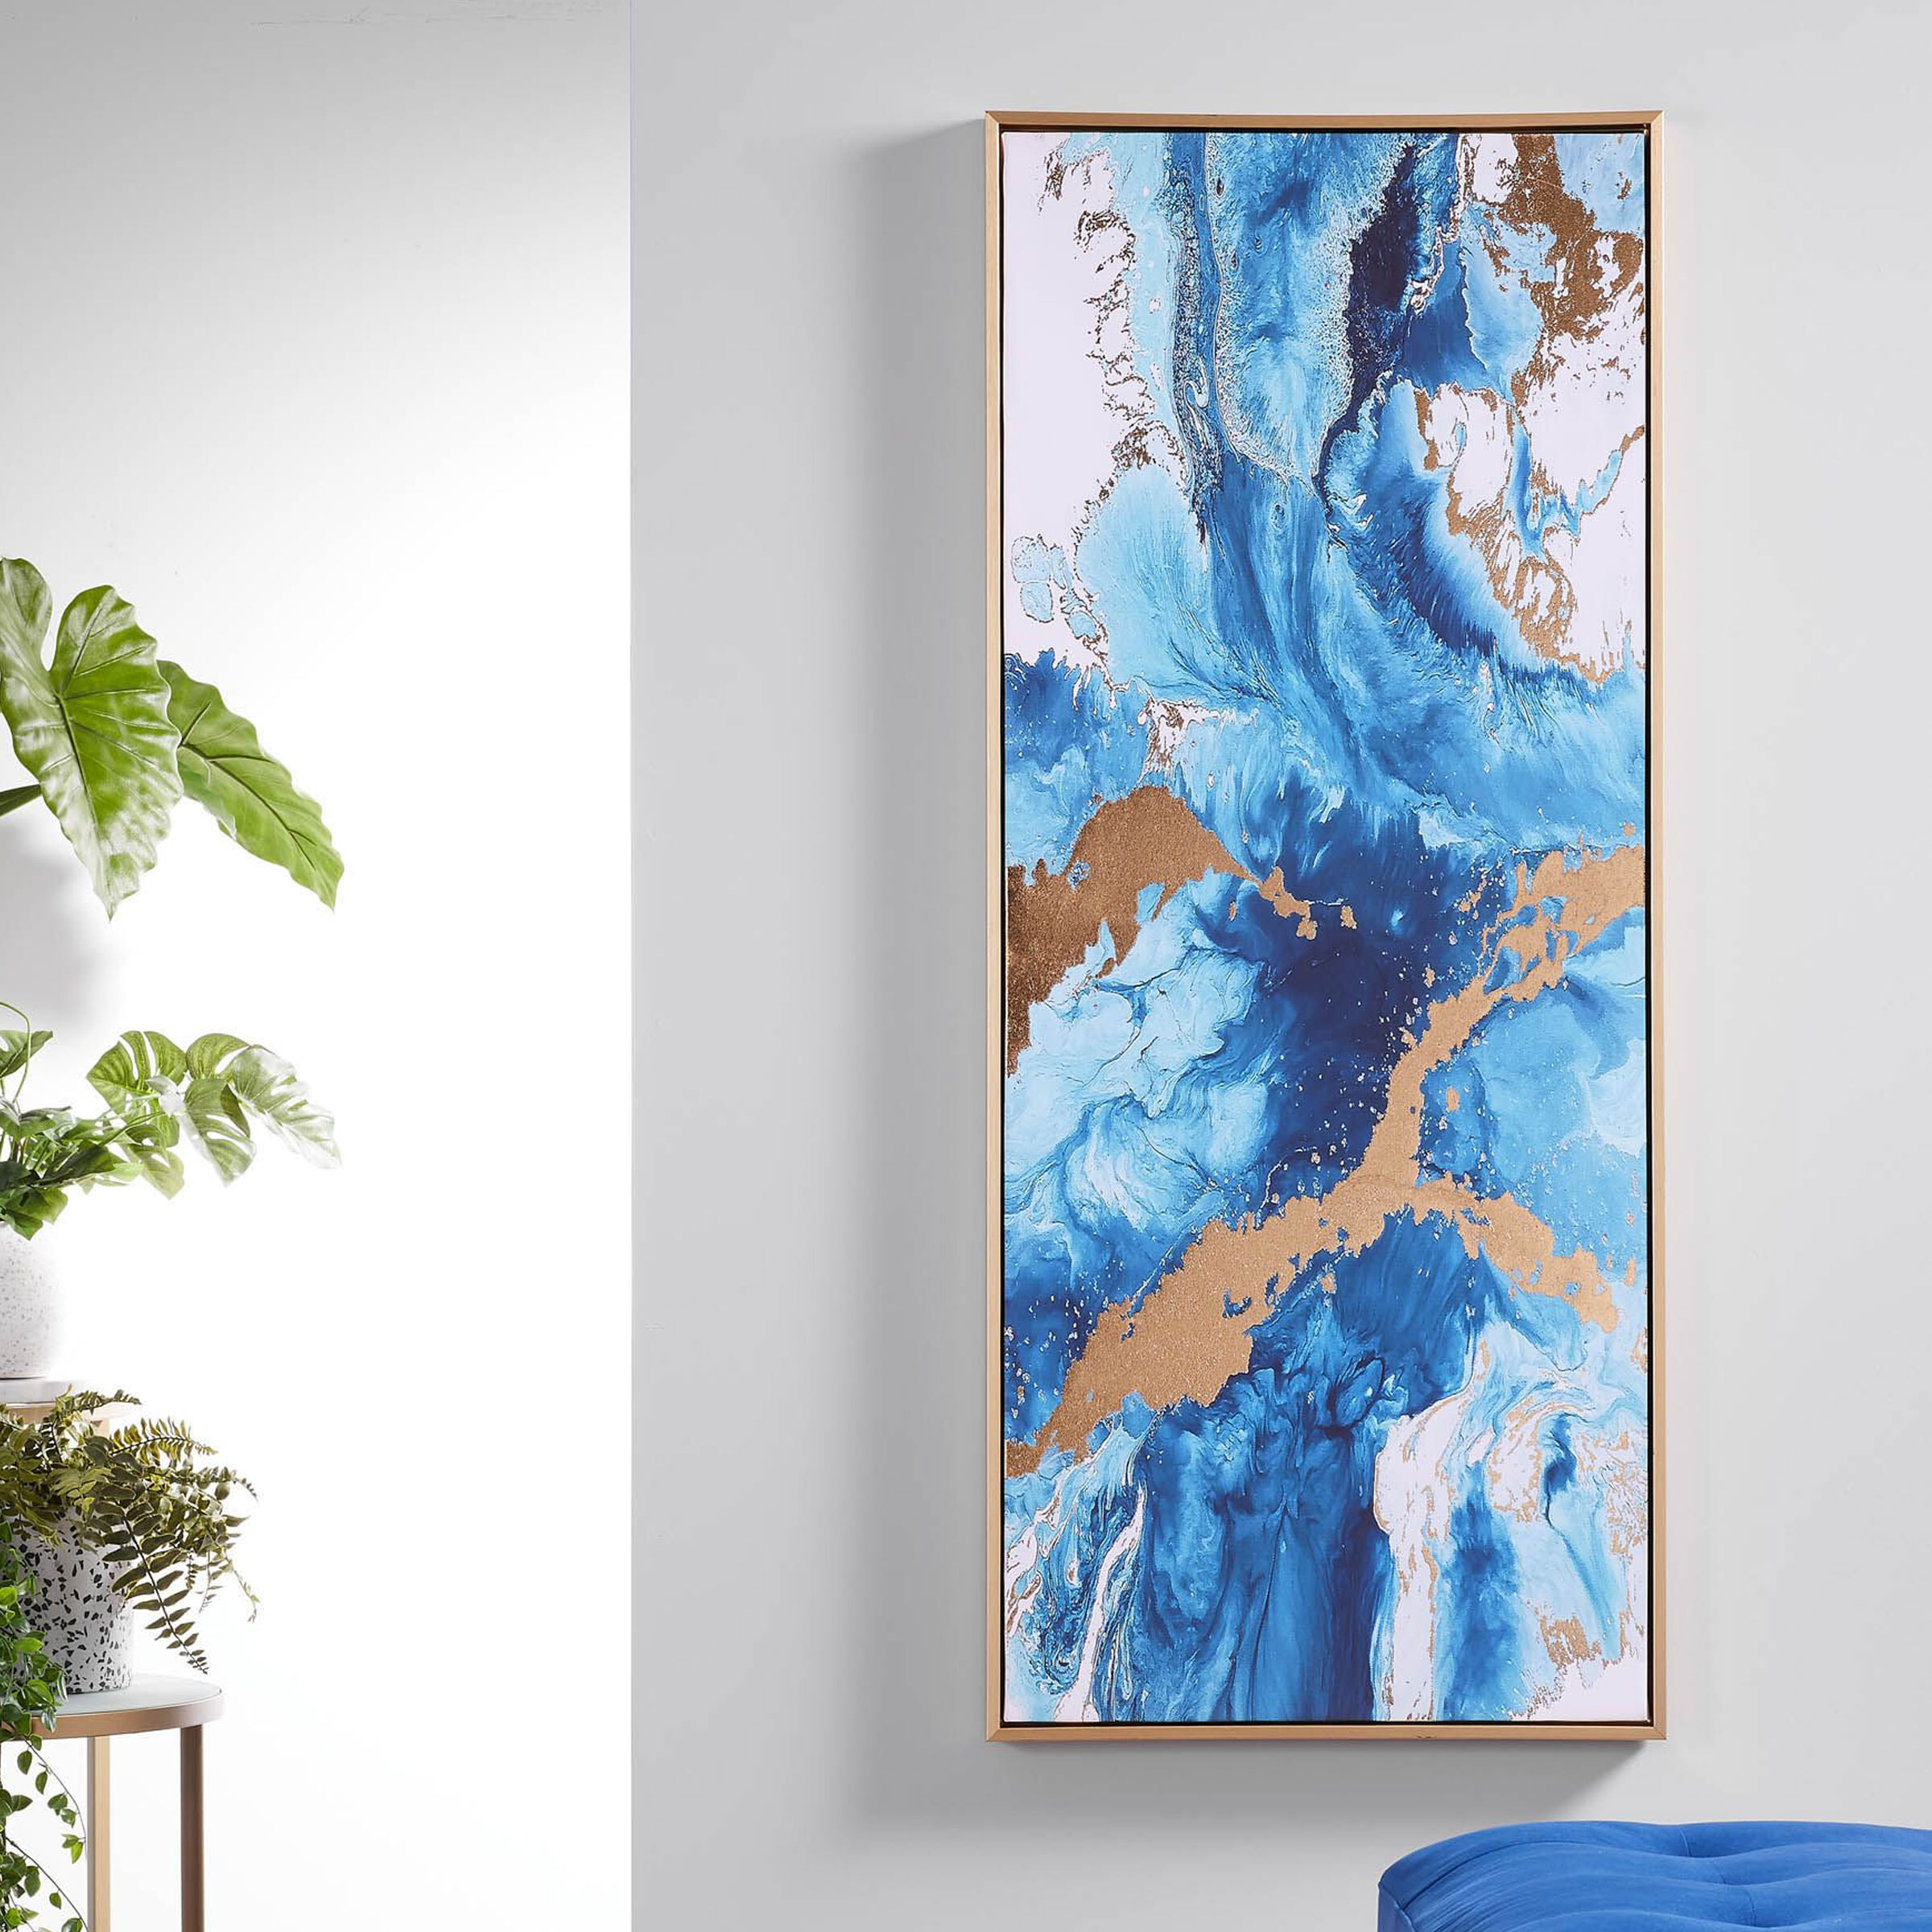 Kave Home Schilderij 'Iconic' 120 x 50cm